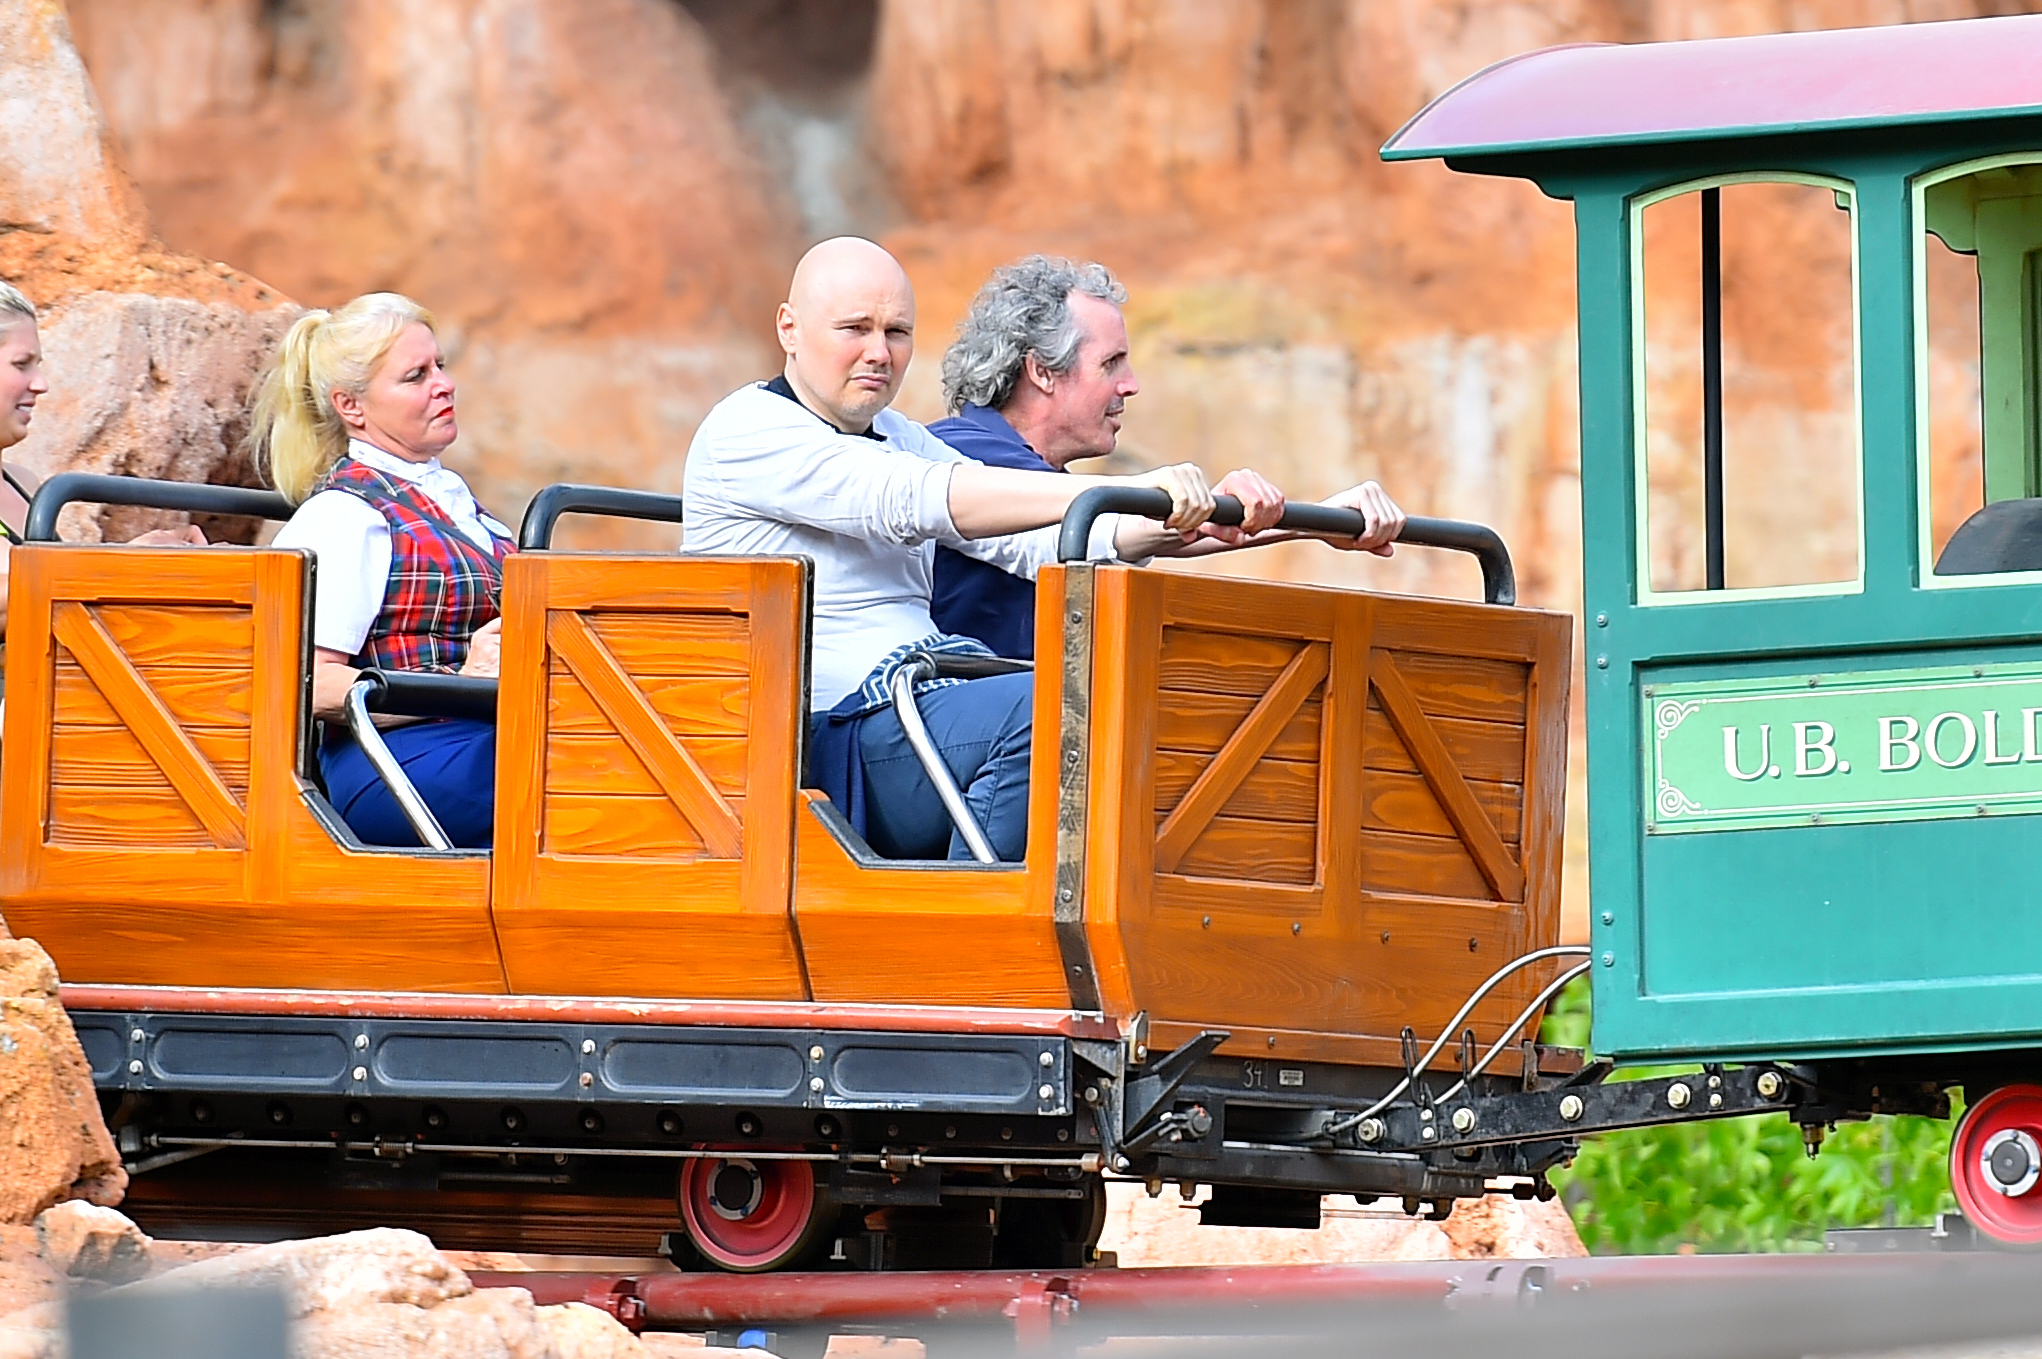 Billy Corgan Disneyland Photo Photo Of Smashing Pumpkins